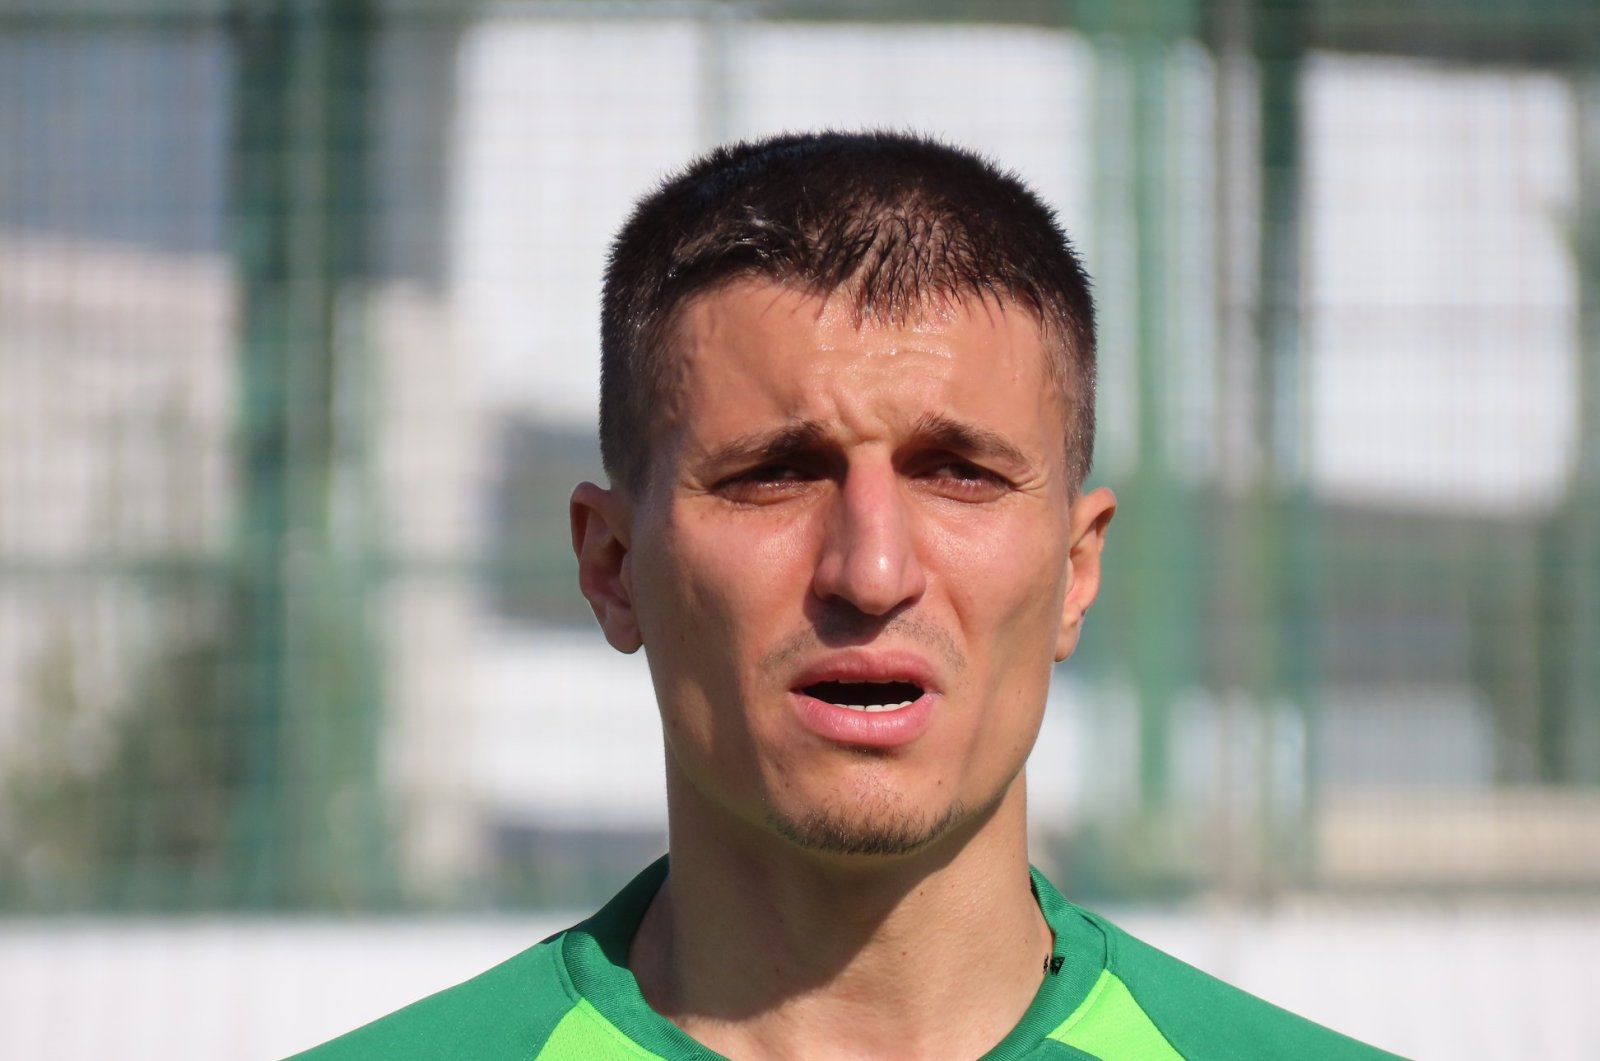 Once a Süper Lig player, Toktaş was signed with Regional Amateur League club Bursa Yıldırımspor. (DHA Photo)